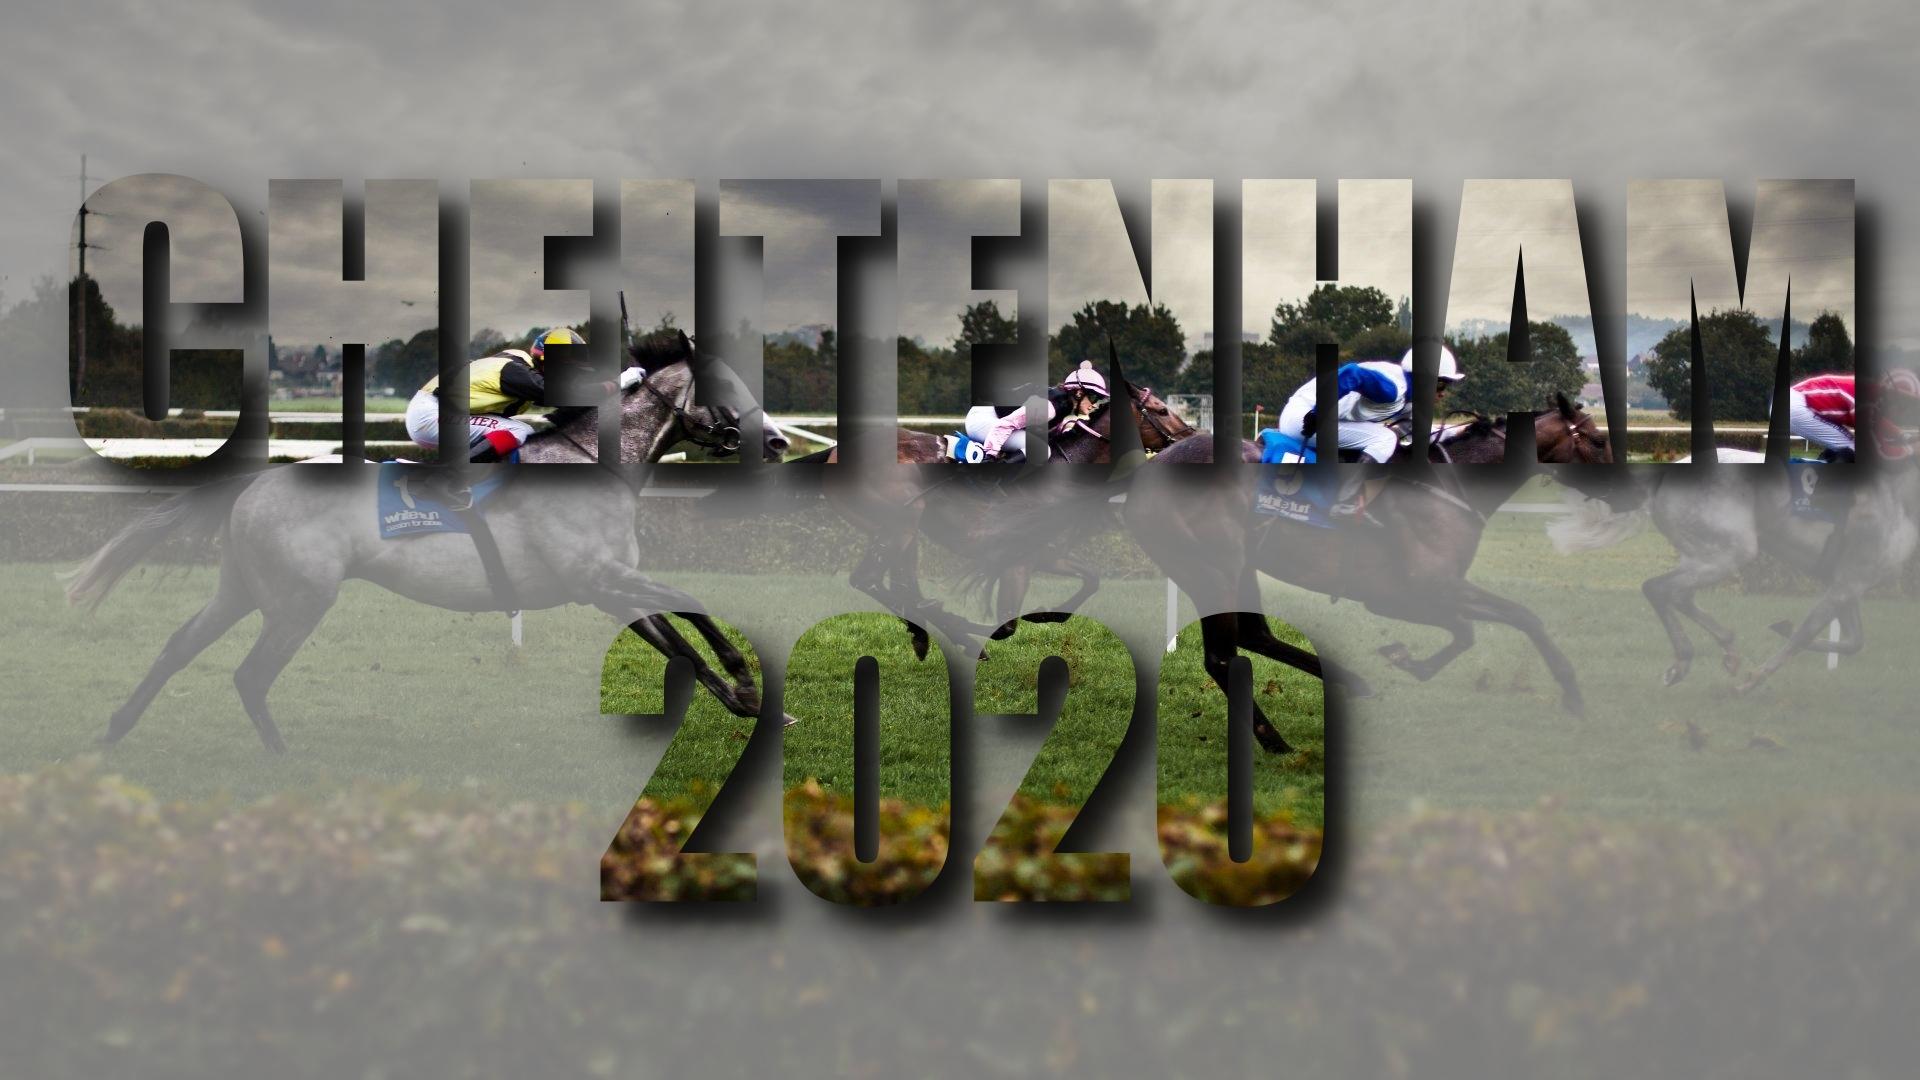 Cheltenham 2020 Day 1